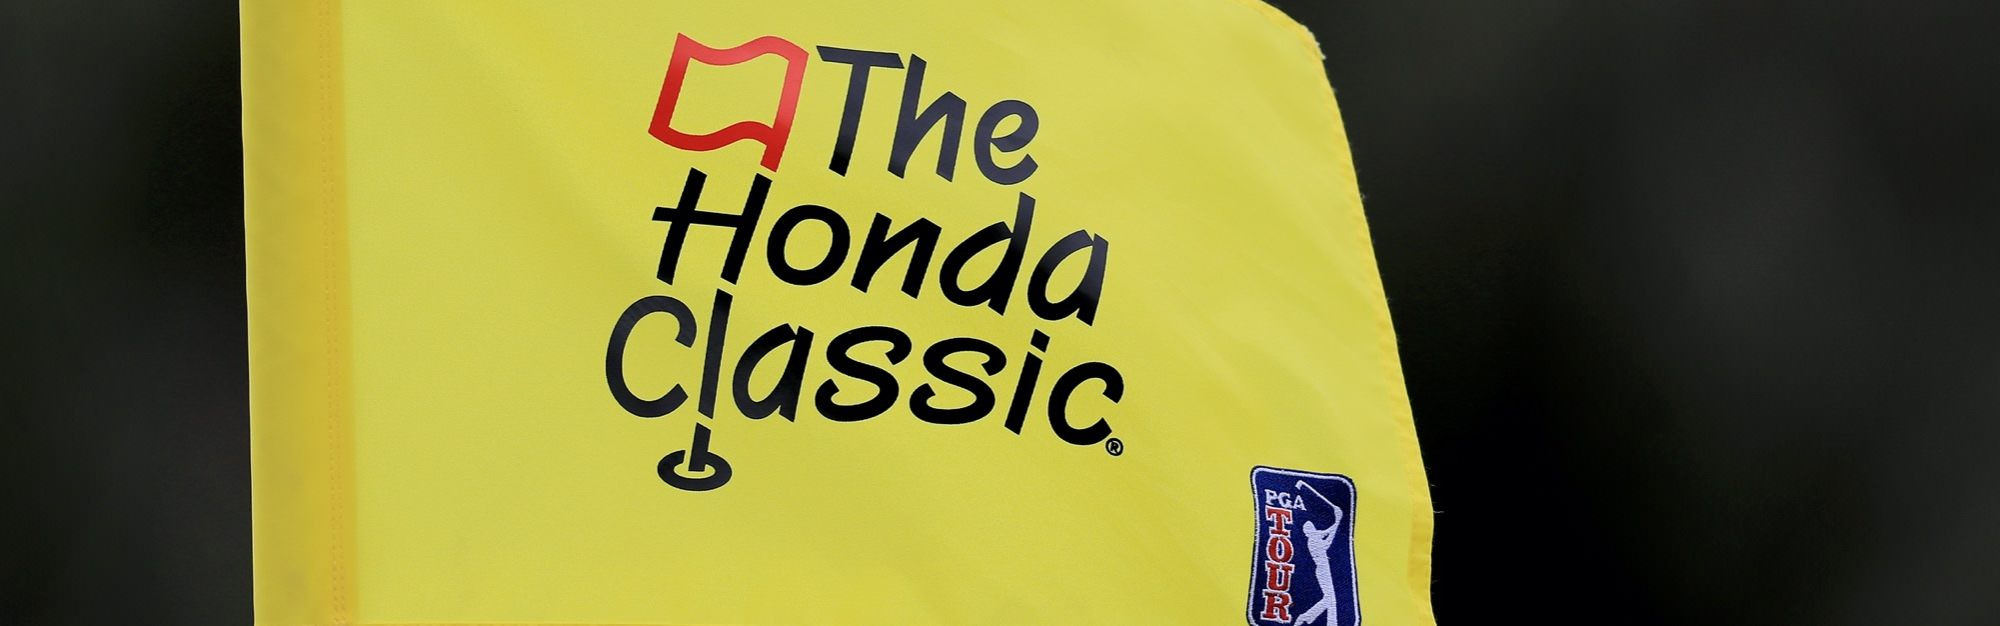 Honda Classic prize money